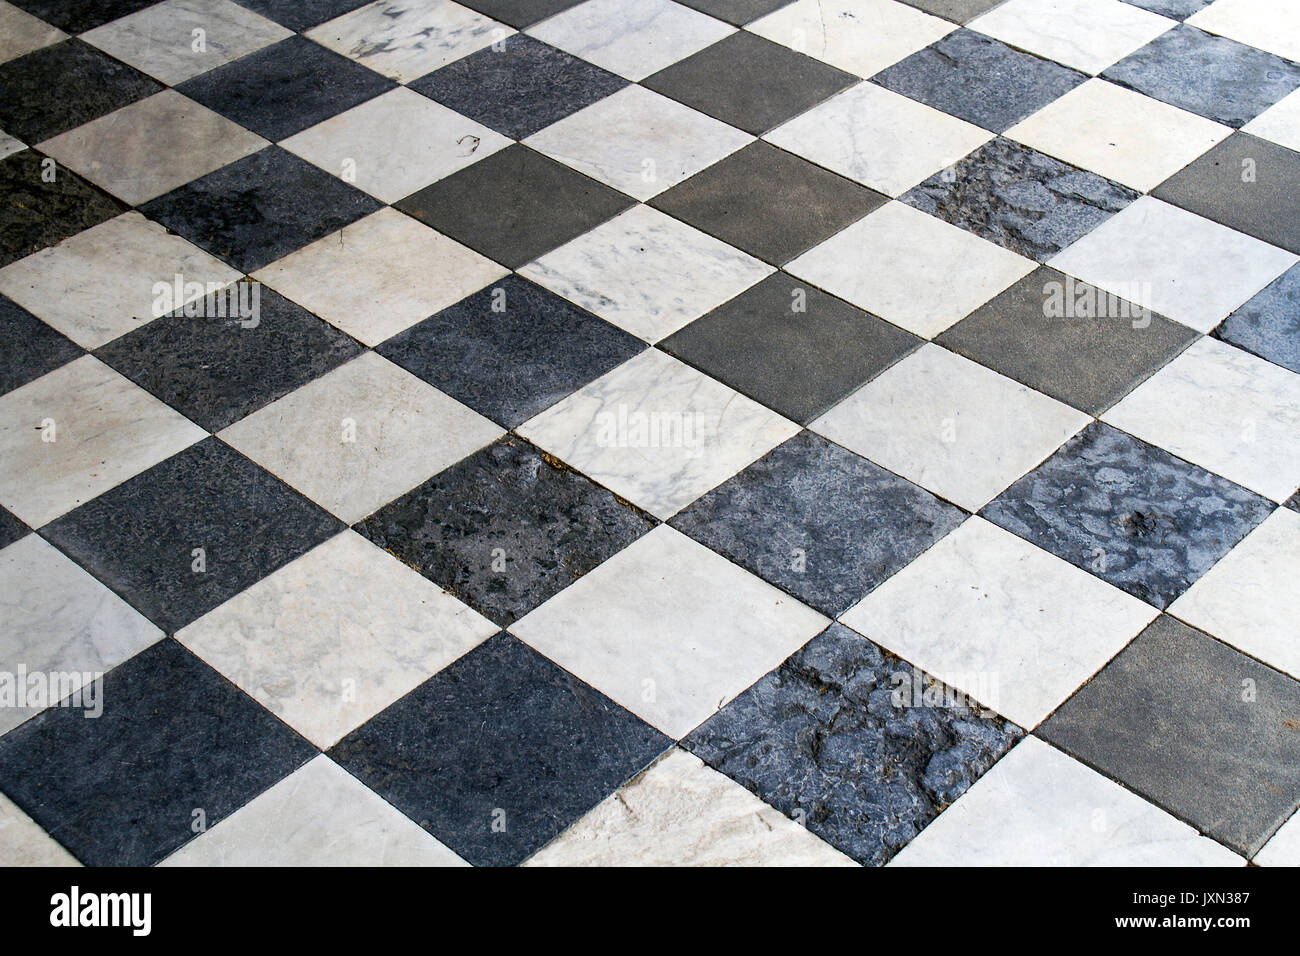 Checkerboard floor stock photos checkerboard floor stock images checkerboard flooring at gallaudet university washington dc usa stock image dailygadgetfo Gallery